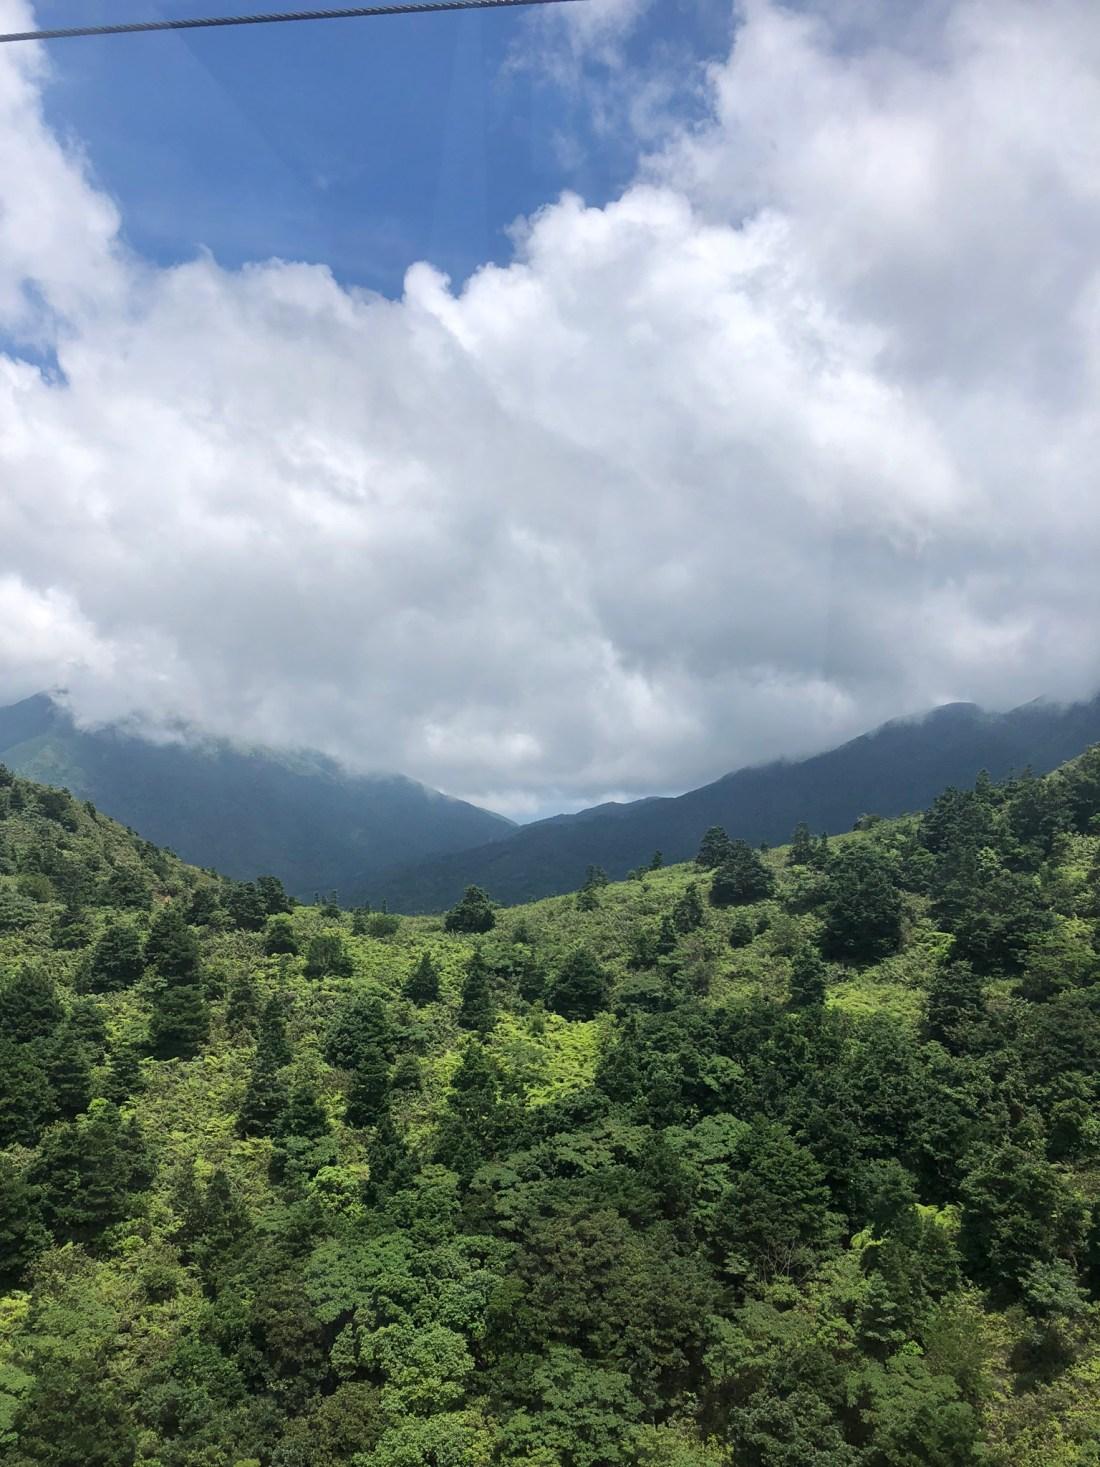 Clouds over Lantau Island, Hong Kong